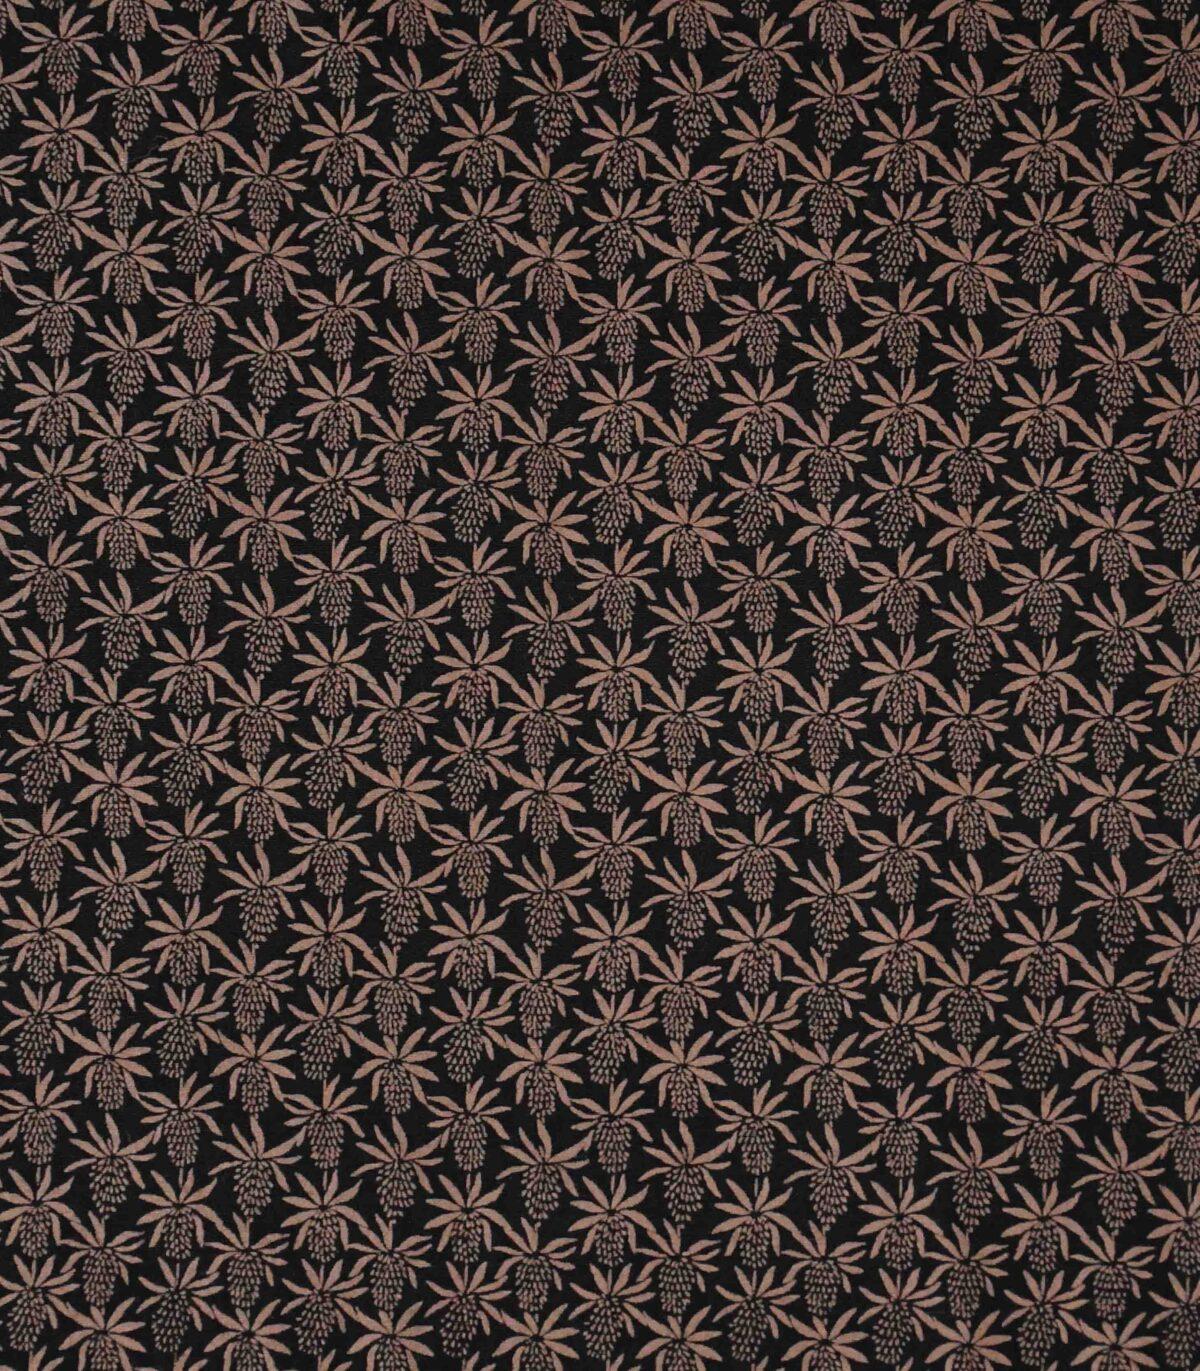 Cotton Black Base Corn Print Fabric